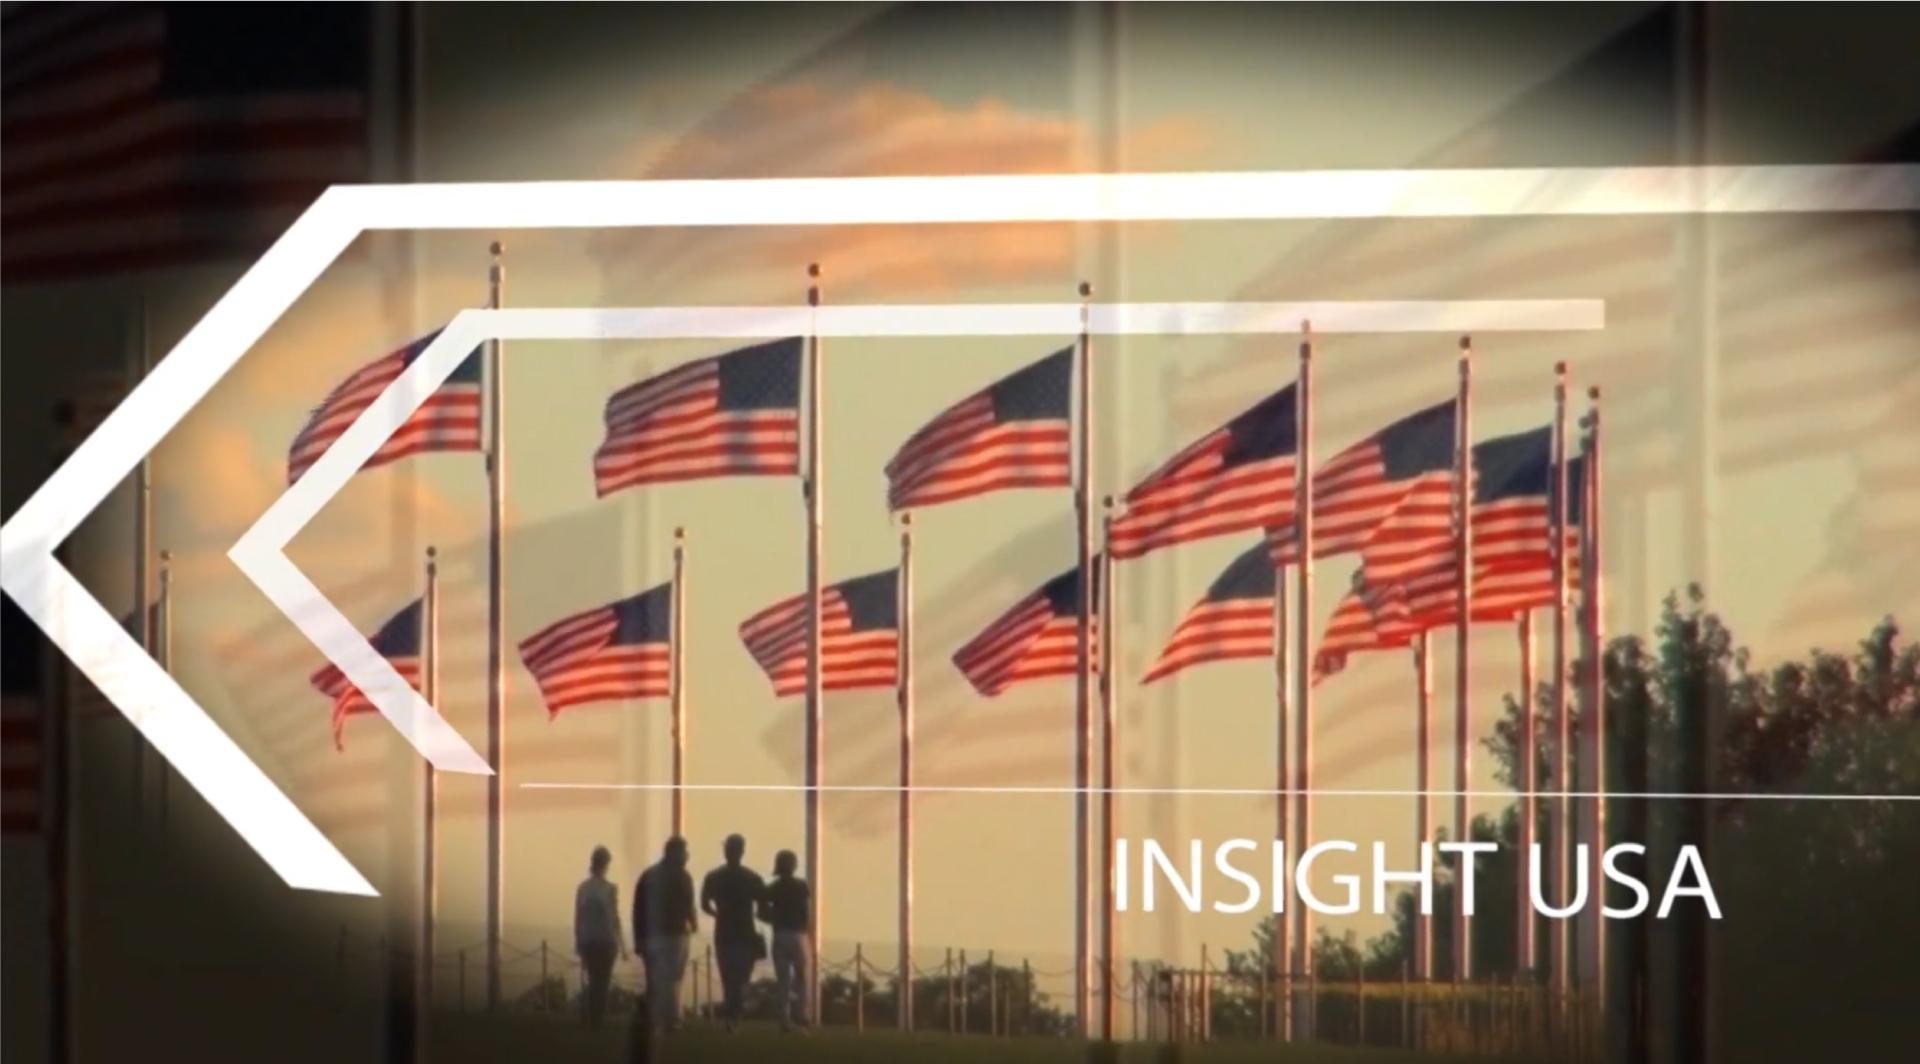 Insight USA